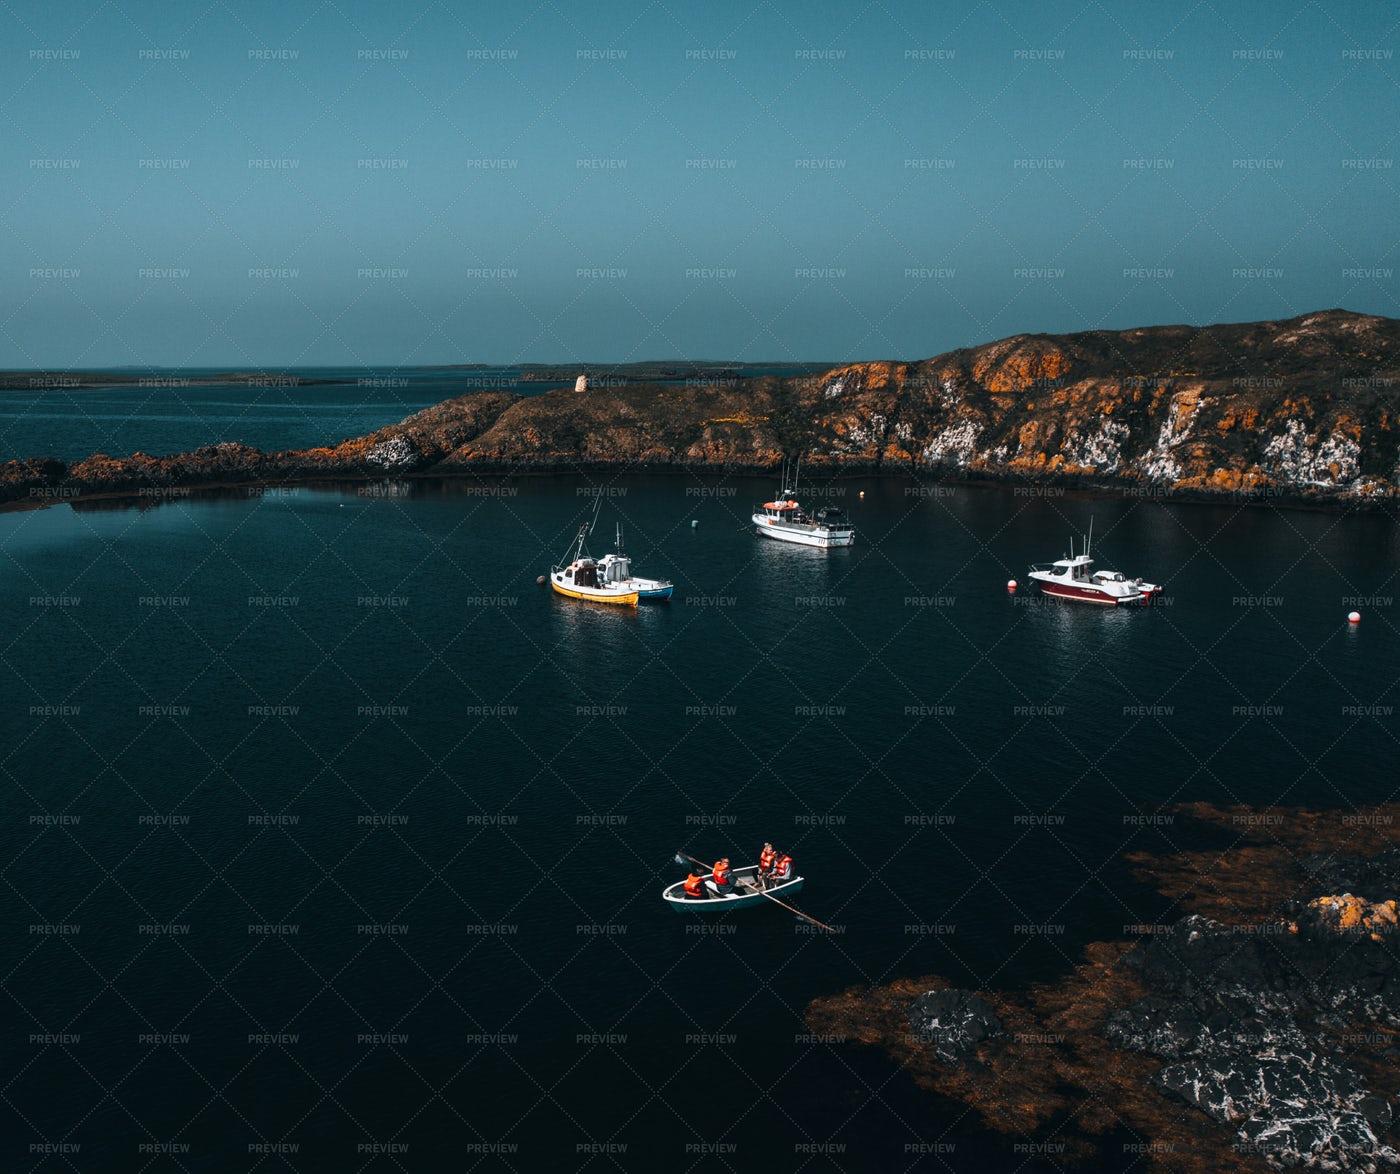 Boats In A Small Rocky Harbor: Stock Photos